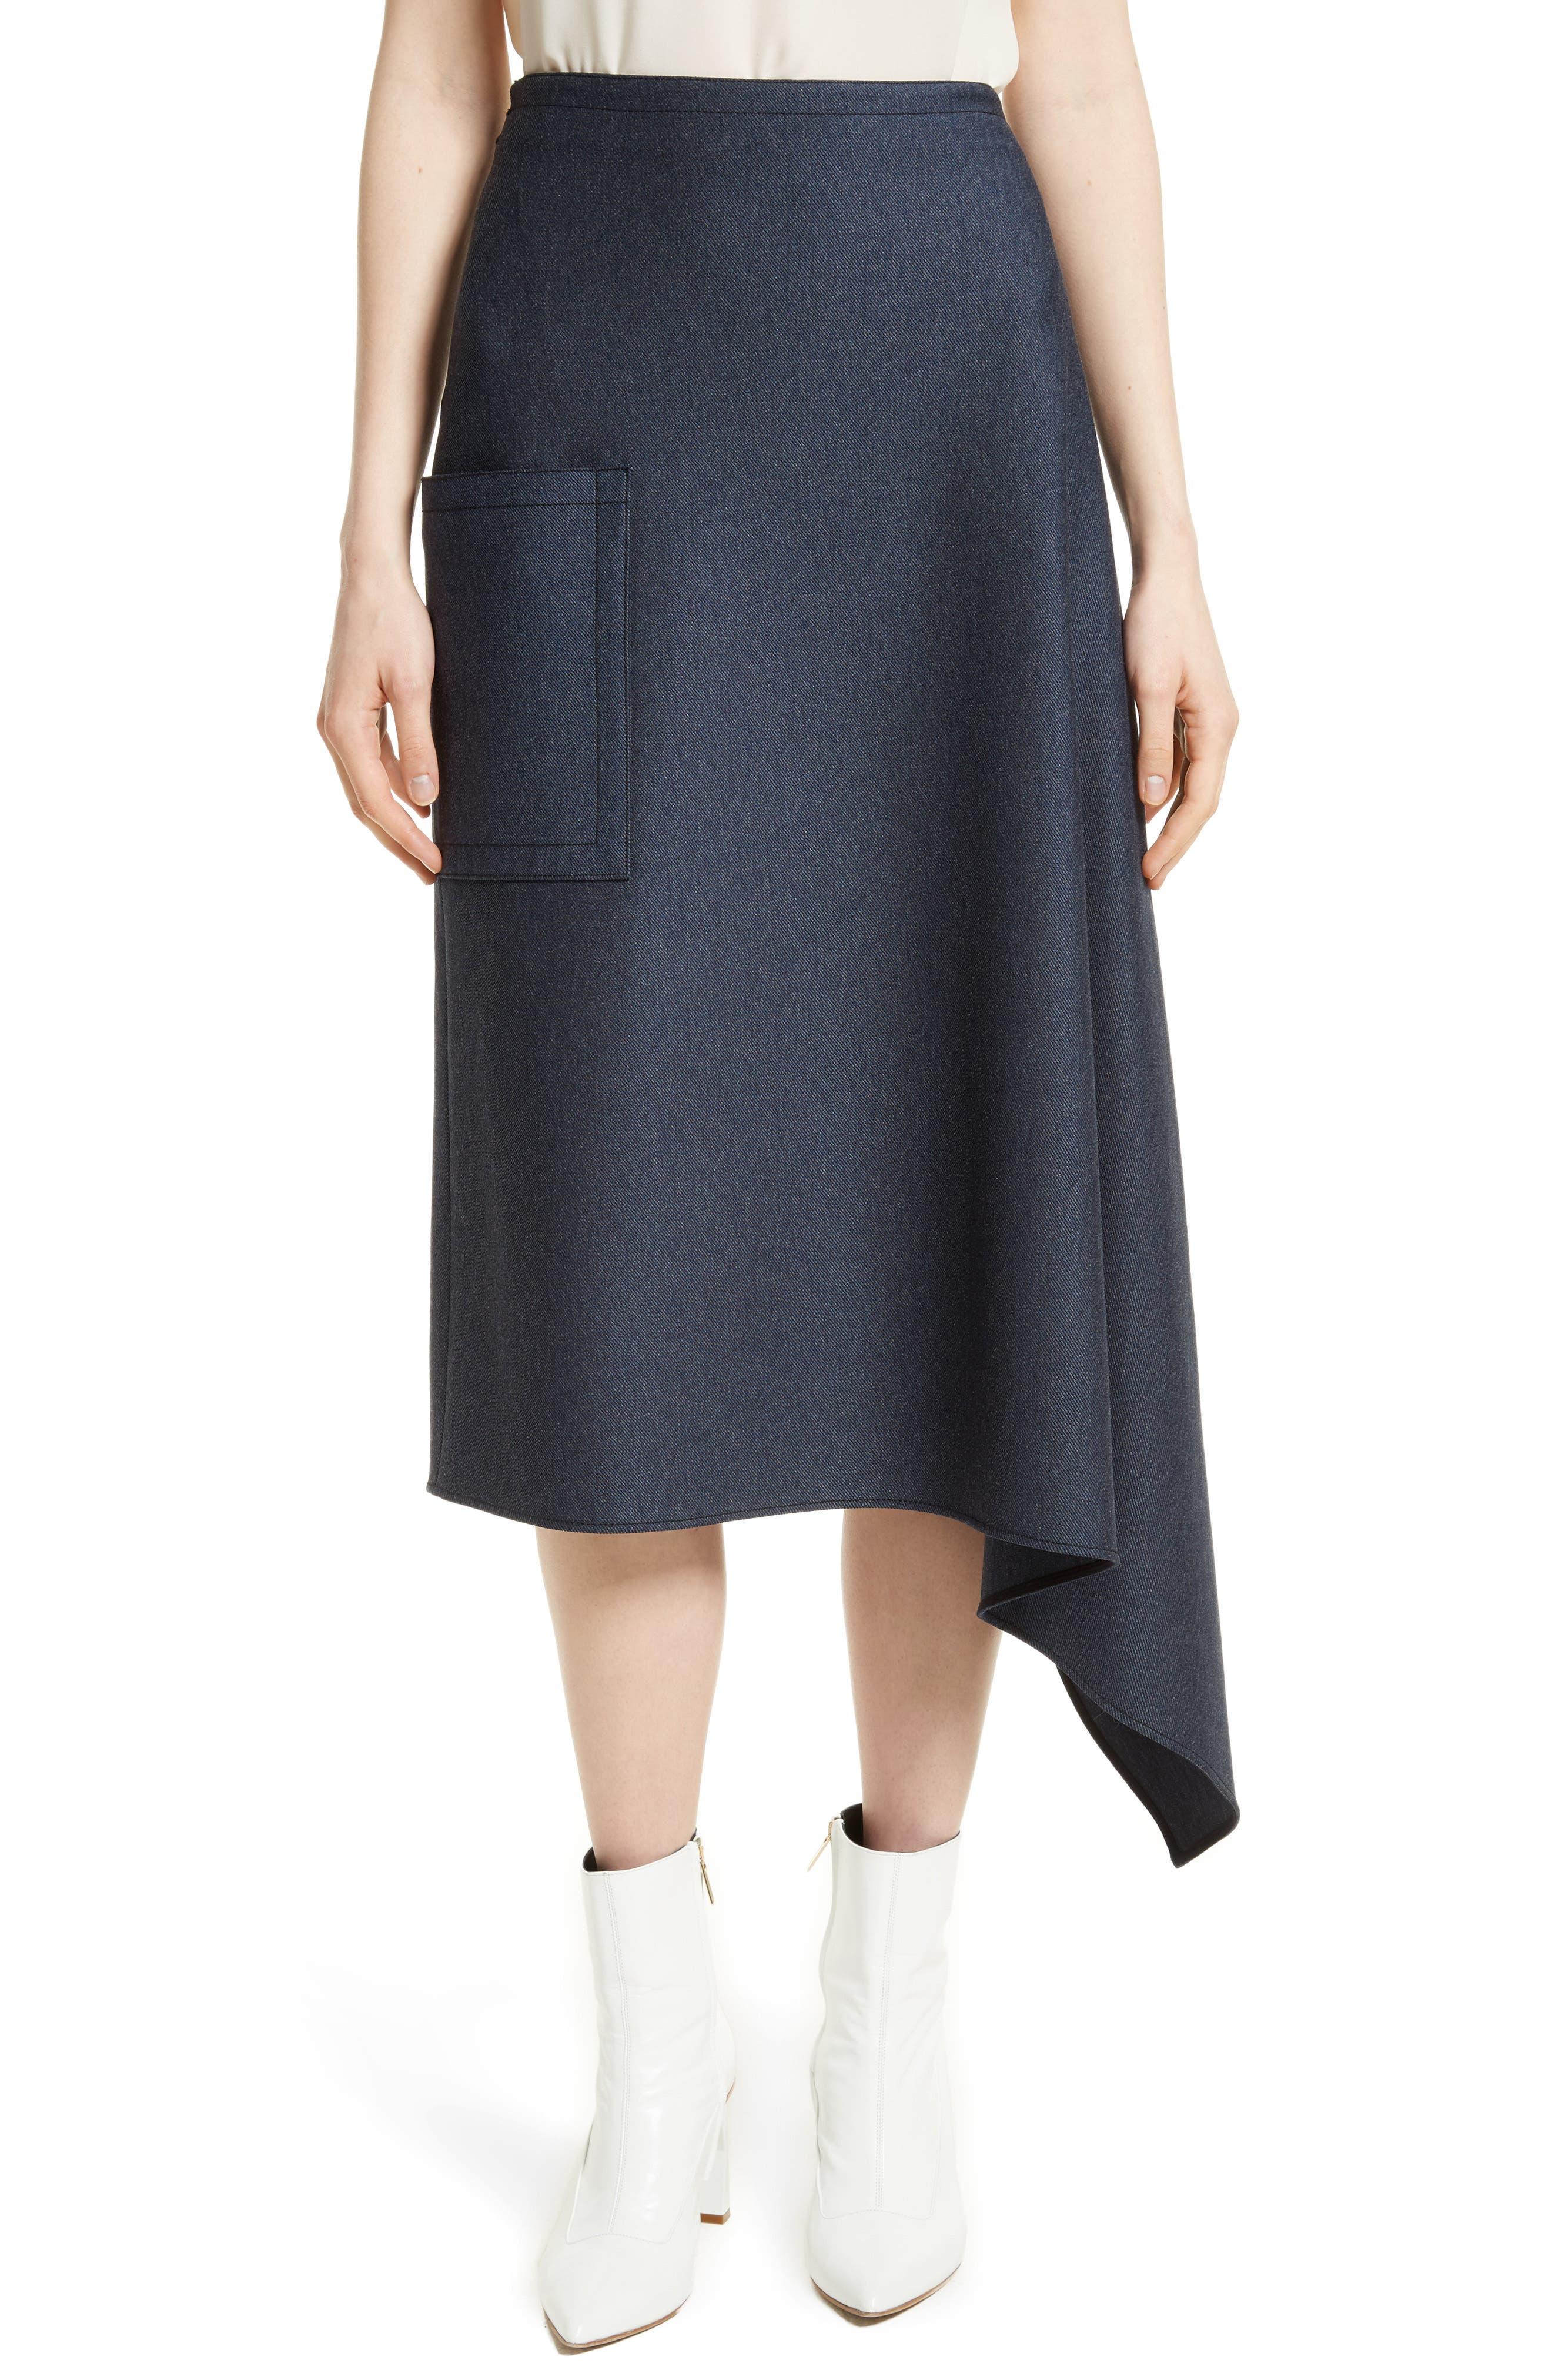 Tibi Origami Asymmetrical Twill Skirt